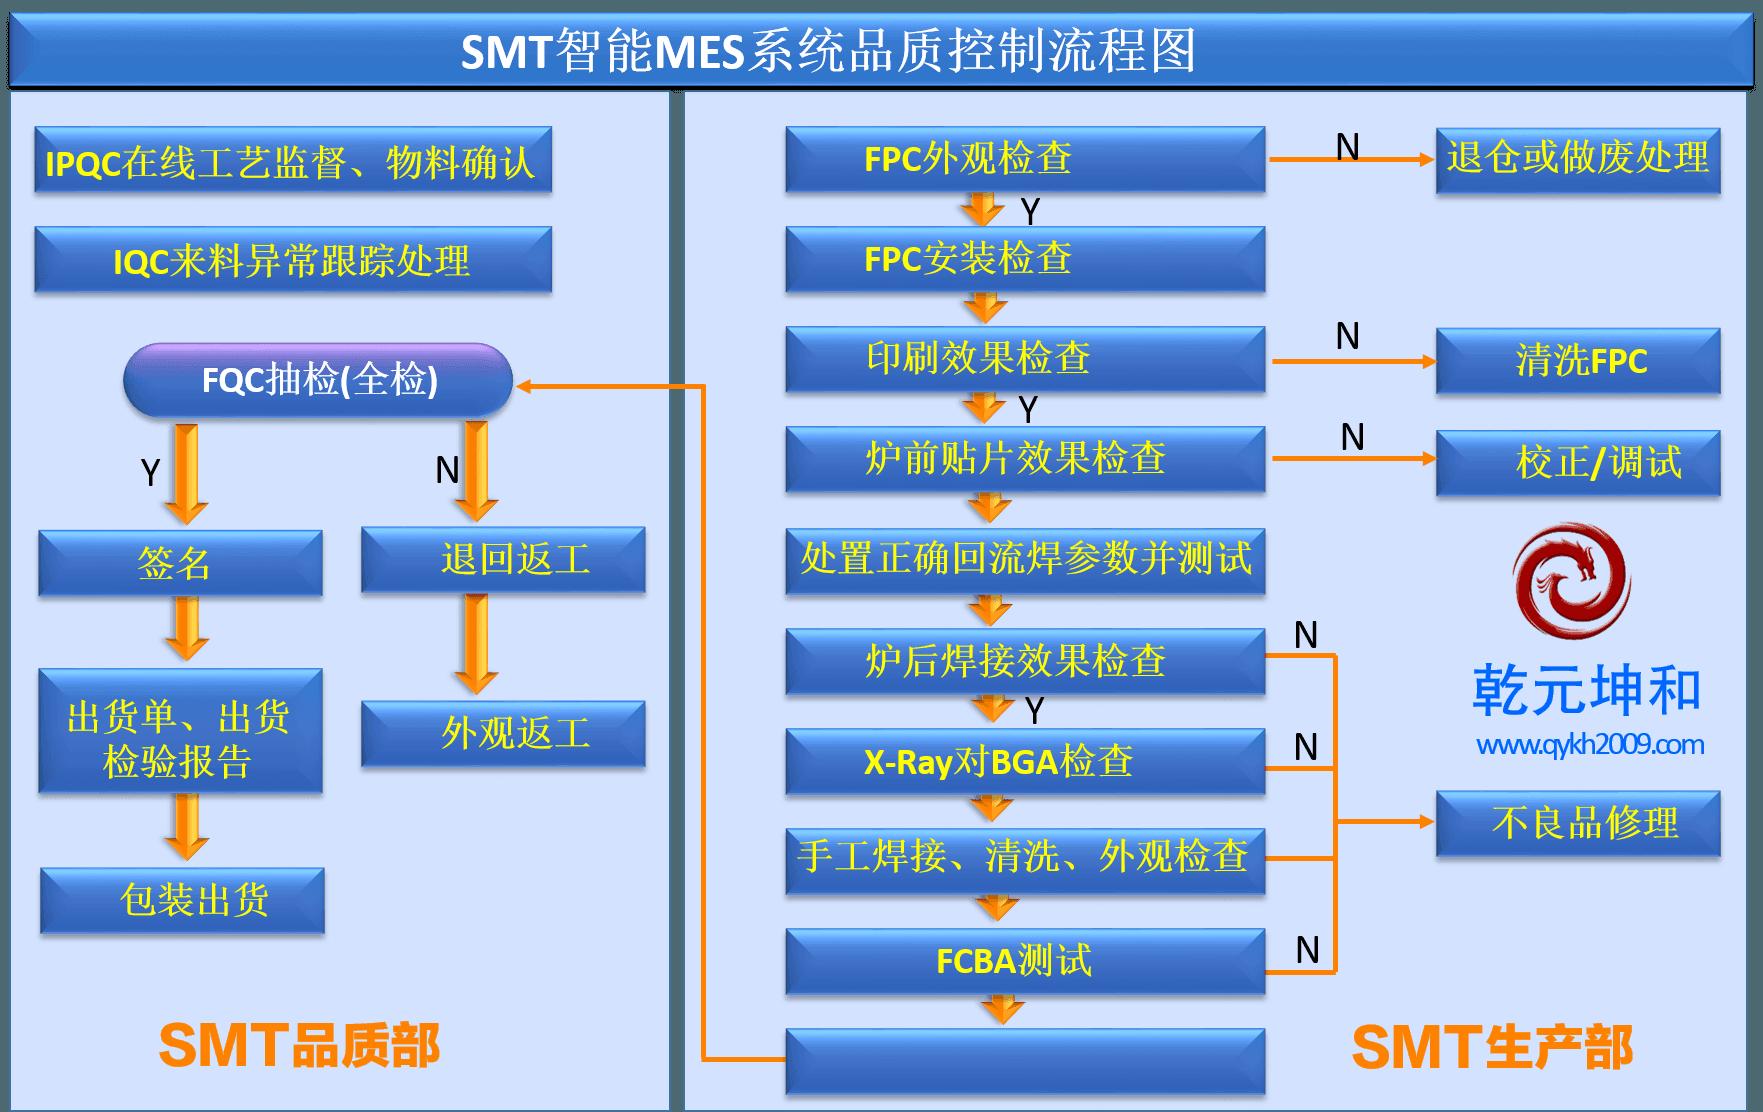 SMT智能MES系统品质控制流程图